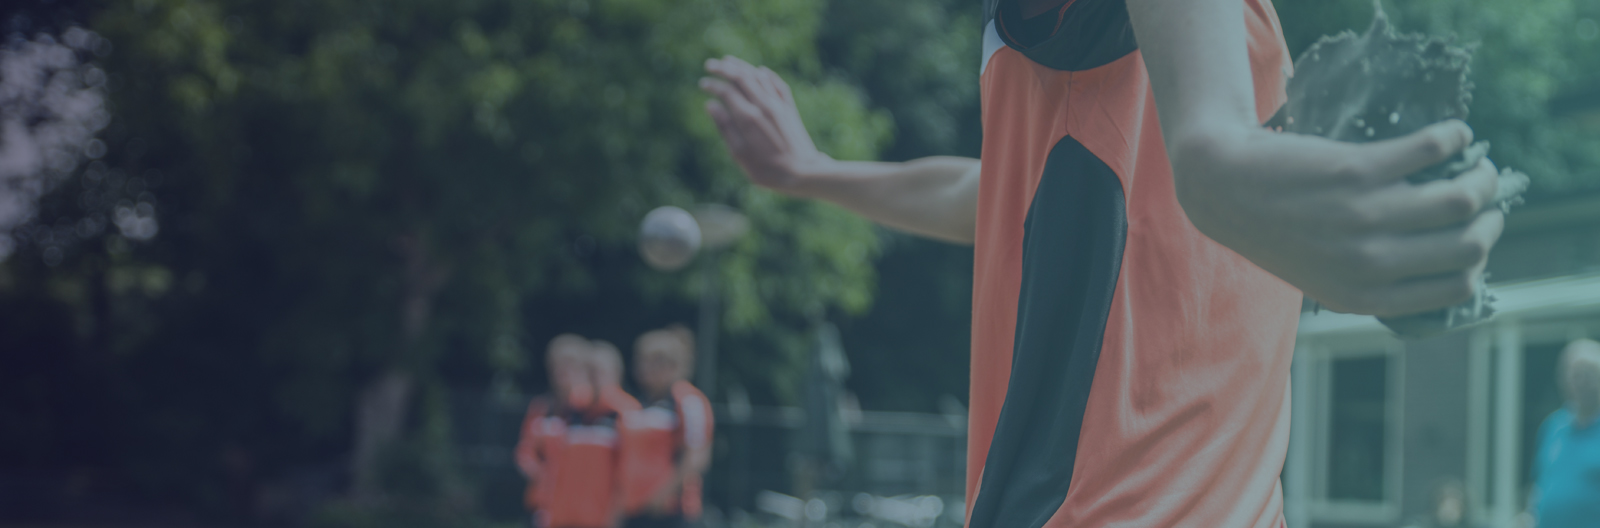 NLpetanque sportplatform van de Nederlandse Jeu de Boules Bond